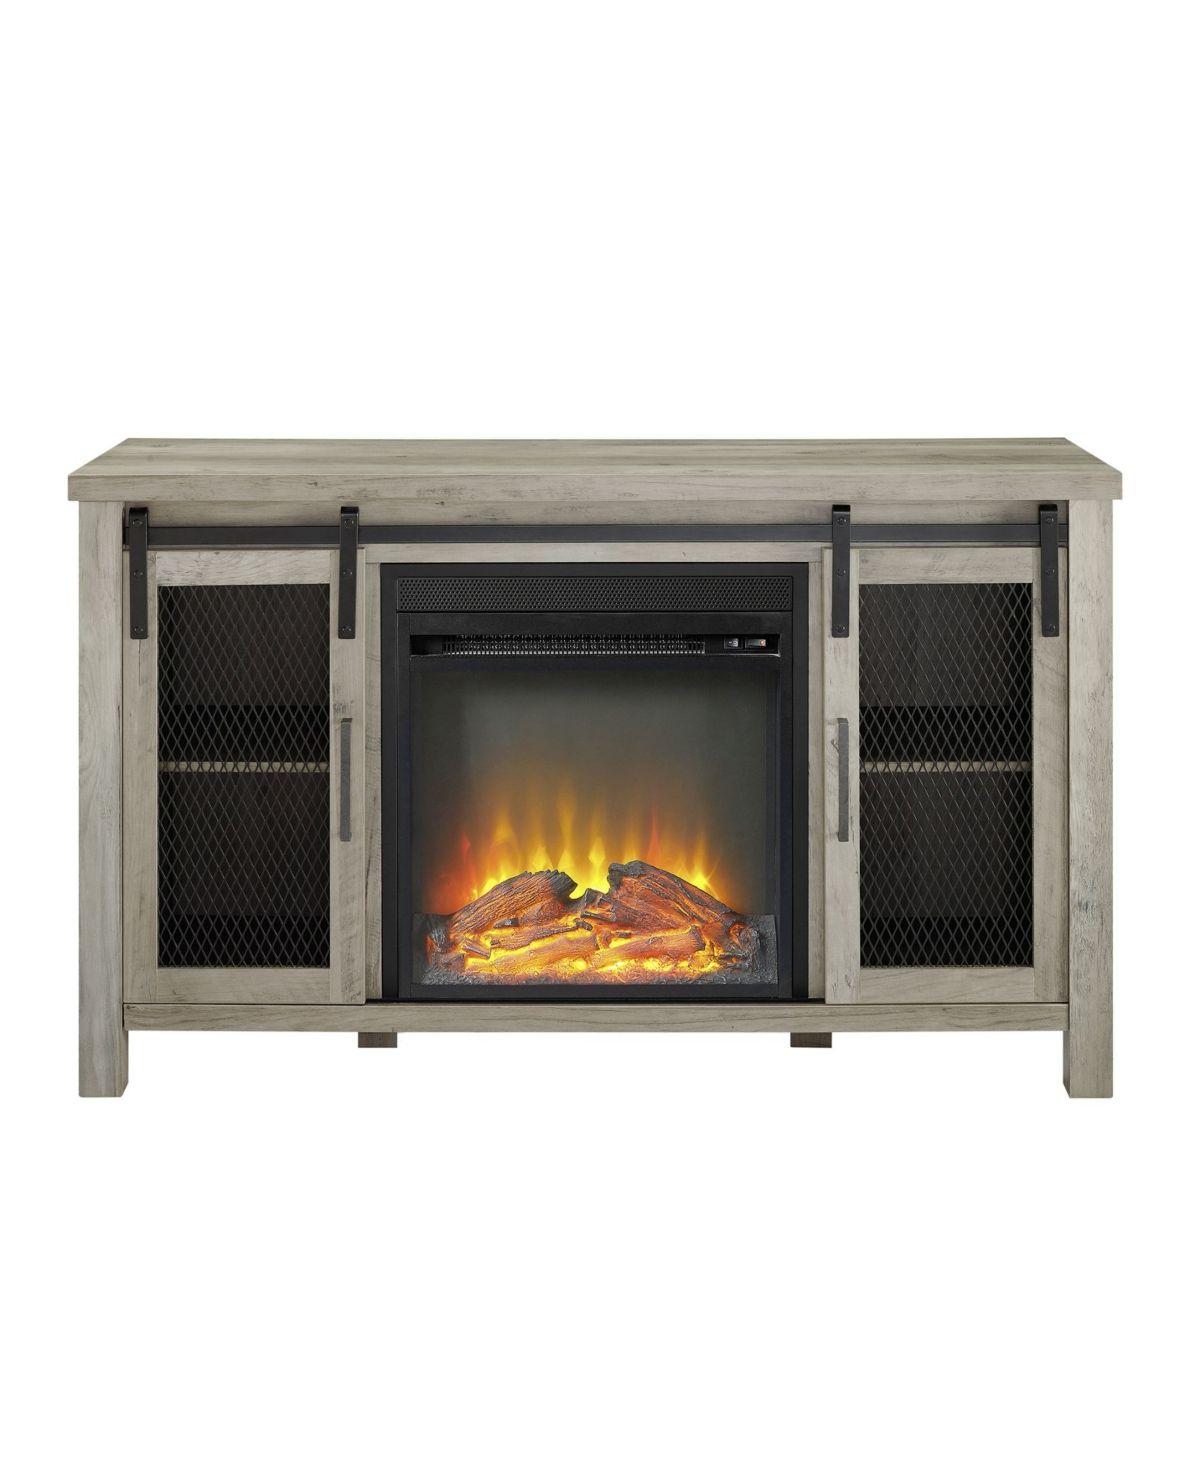 hampton bay electric fireplace tv stand on 18 fireplace ideas fireplace fireplace tv stand electric fireplace pinterest